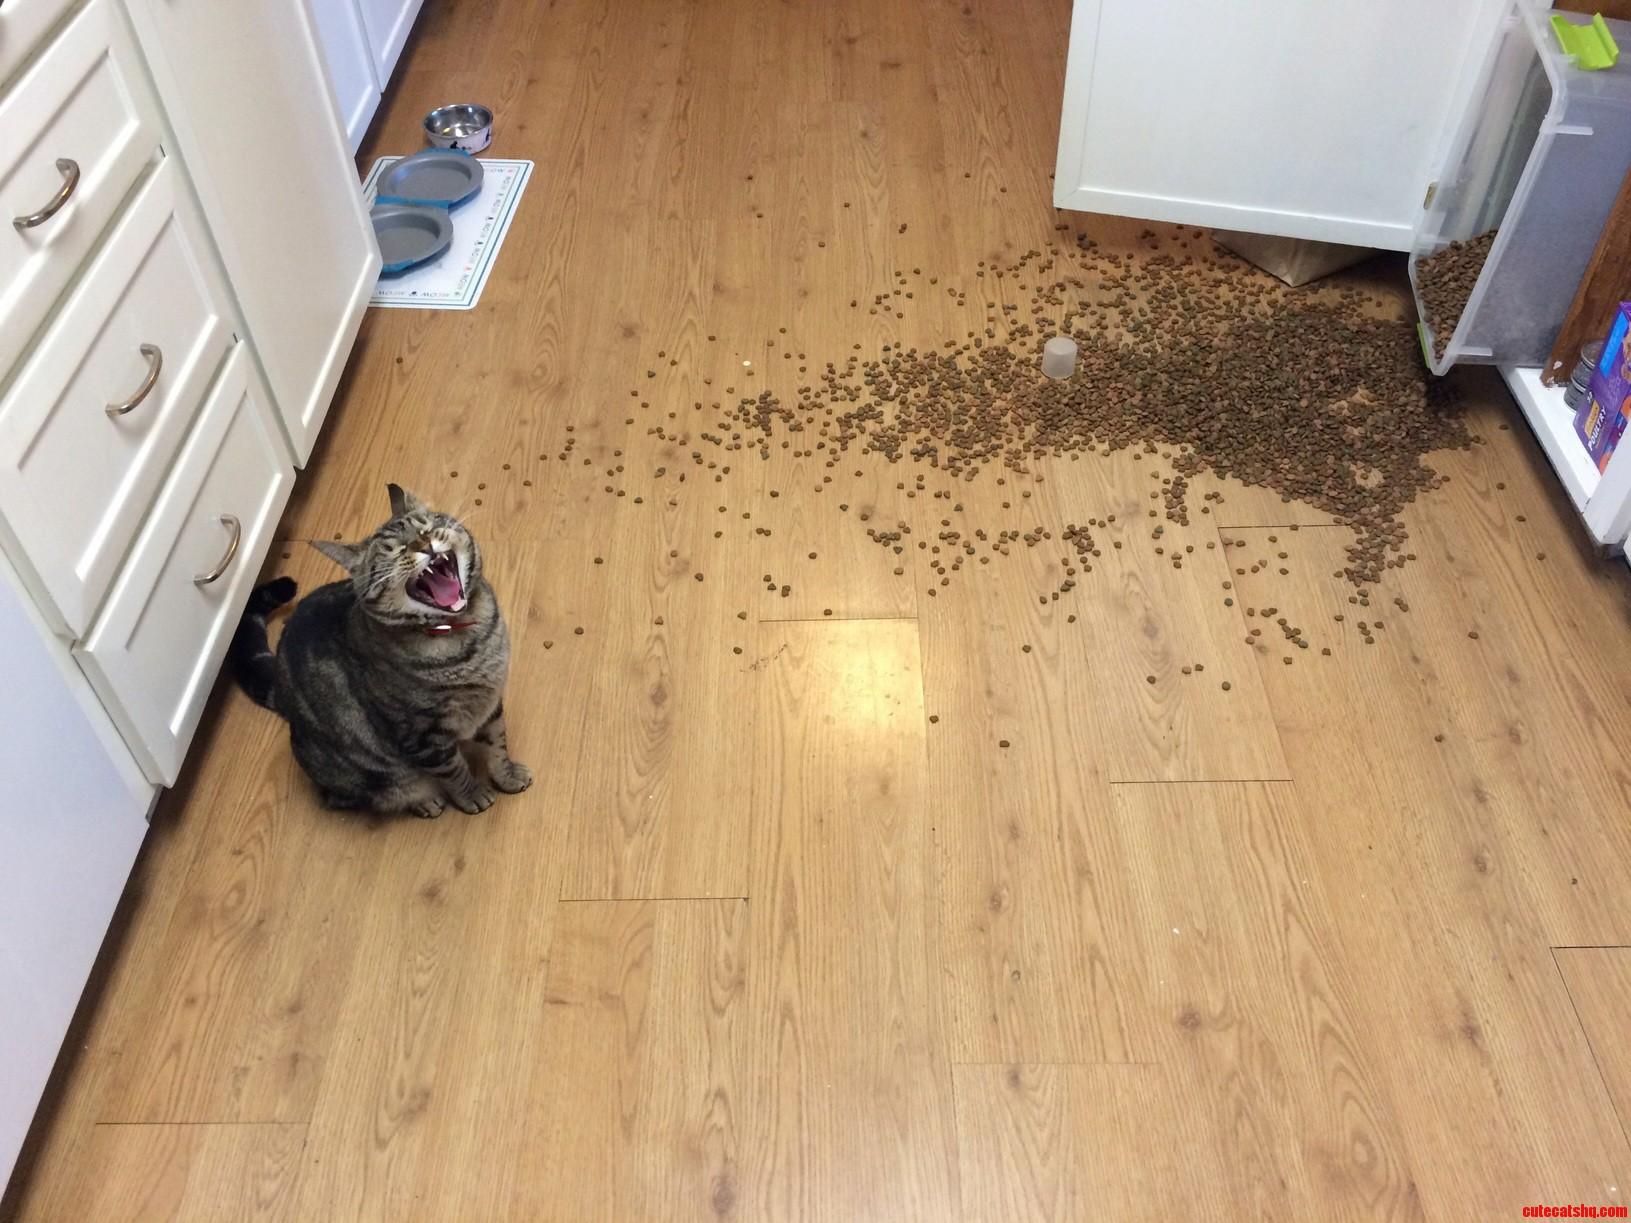 Fix my food